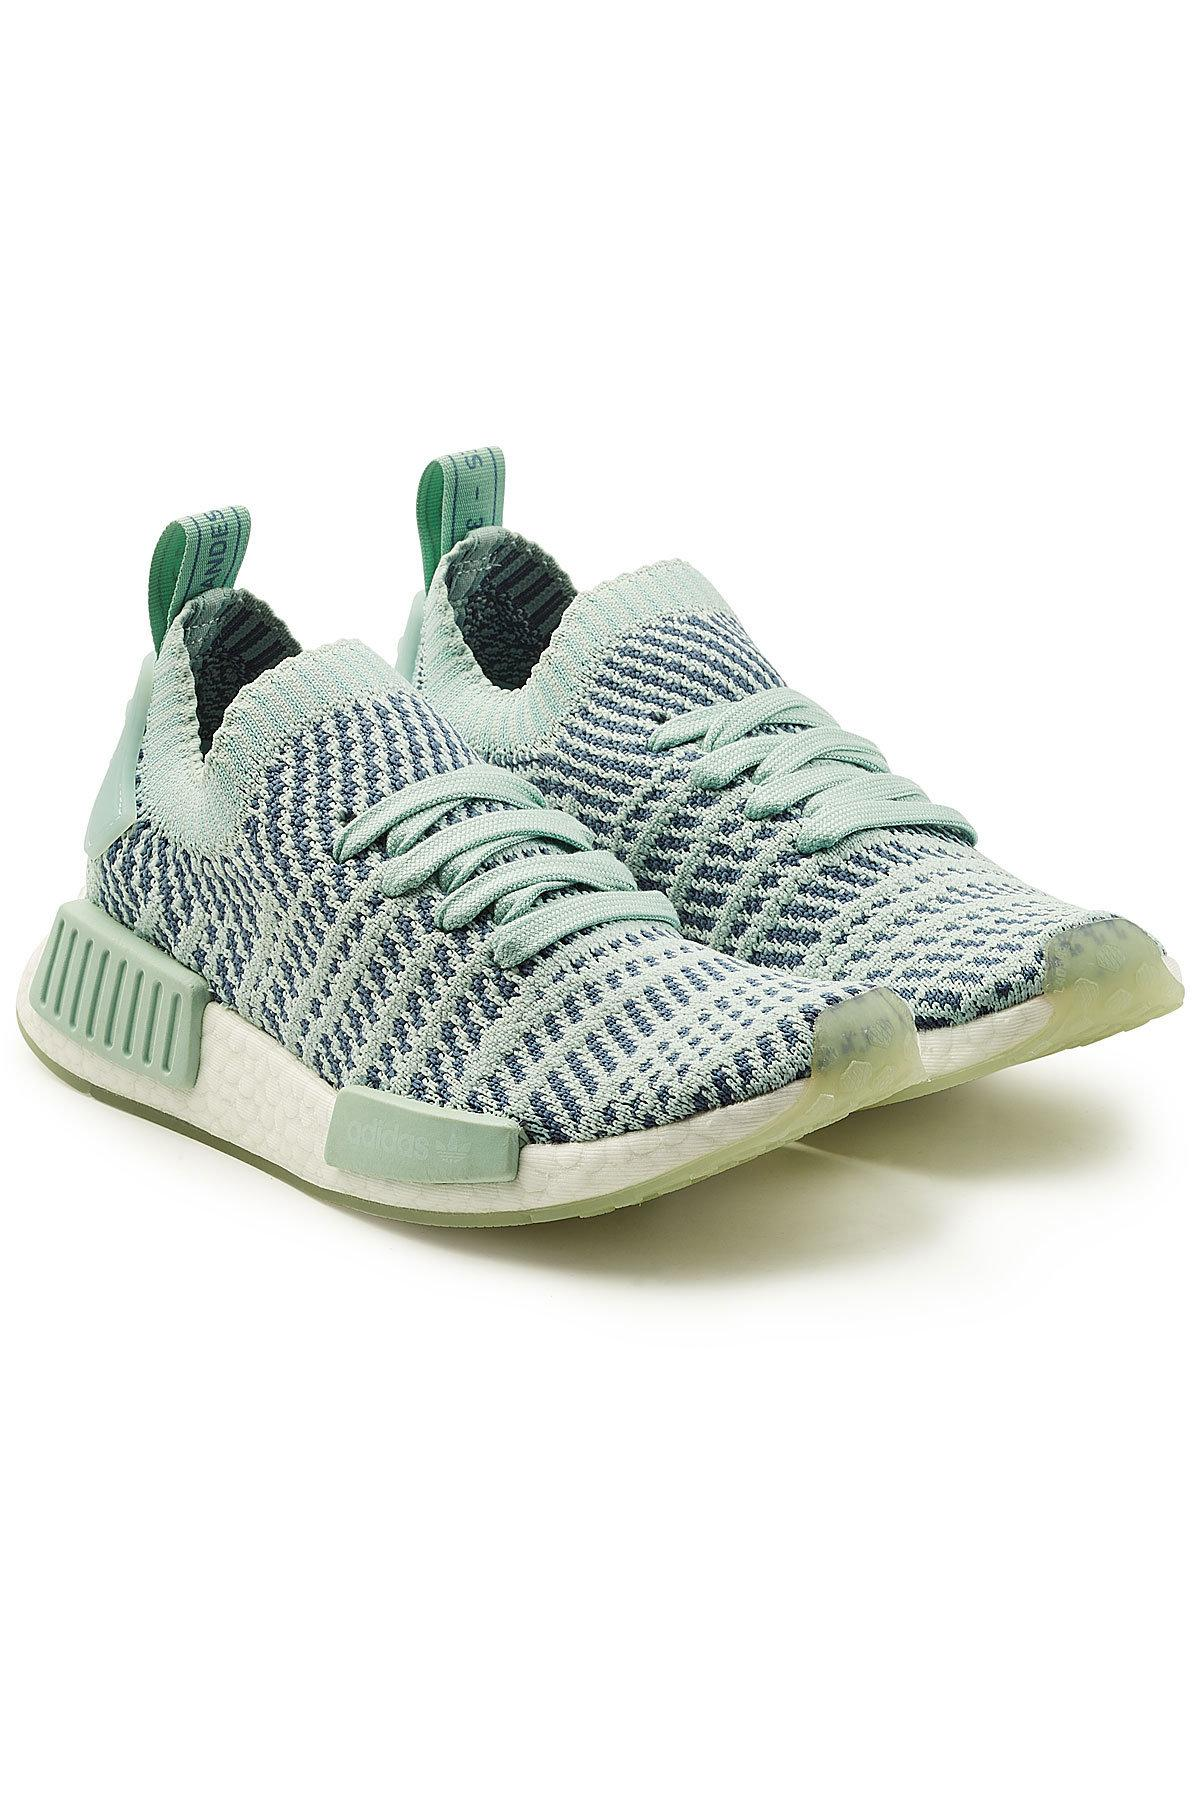 best website 7be58 4bde7 adidas Originals. Women s Nmd R1 Stlt Primeknit Sneakers